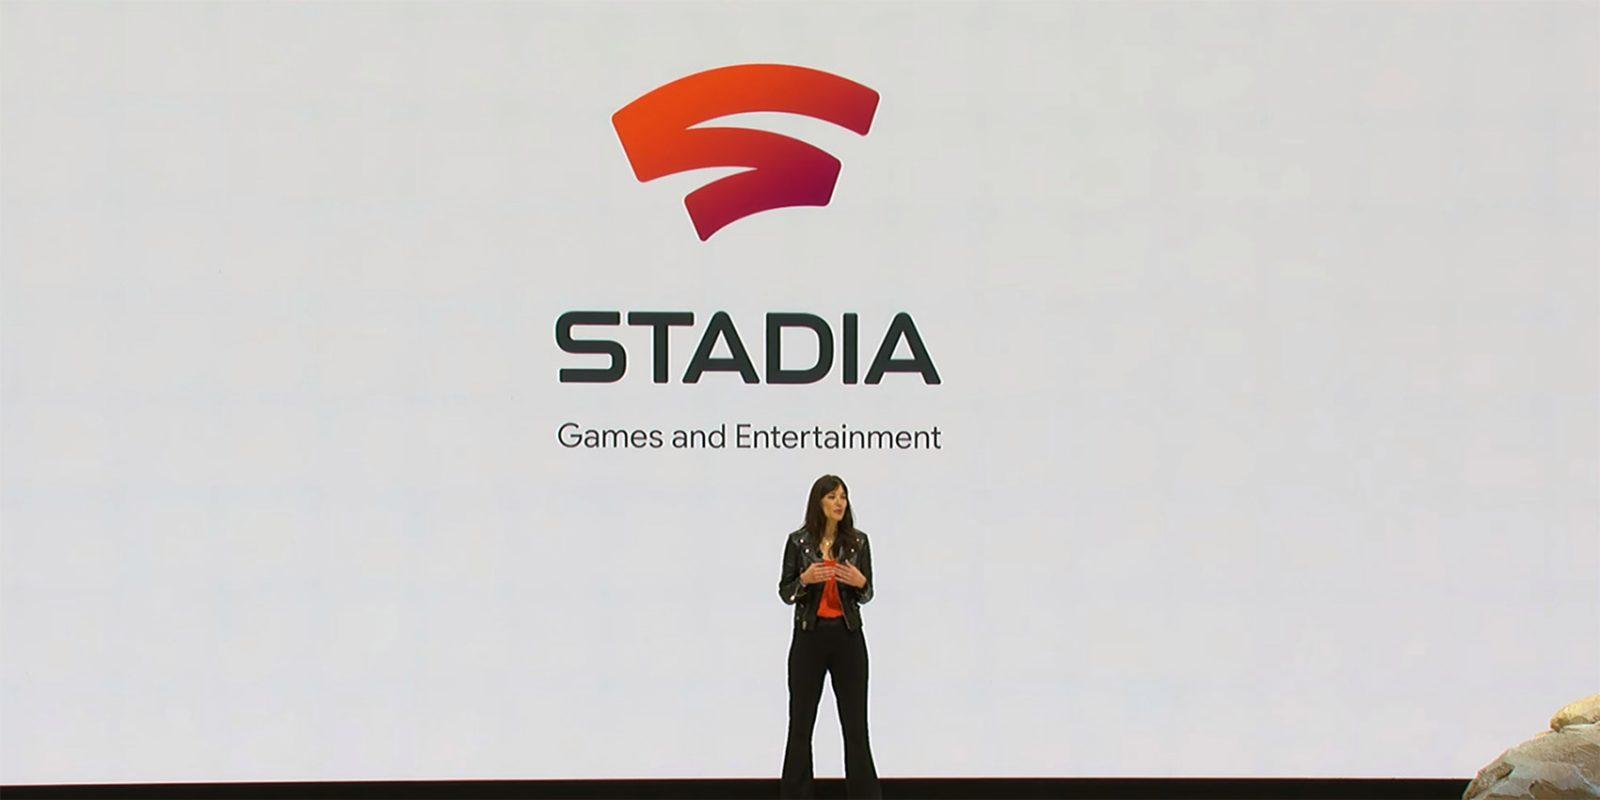 stadia games entertainment studio 1 1